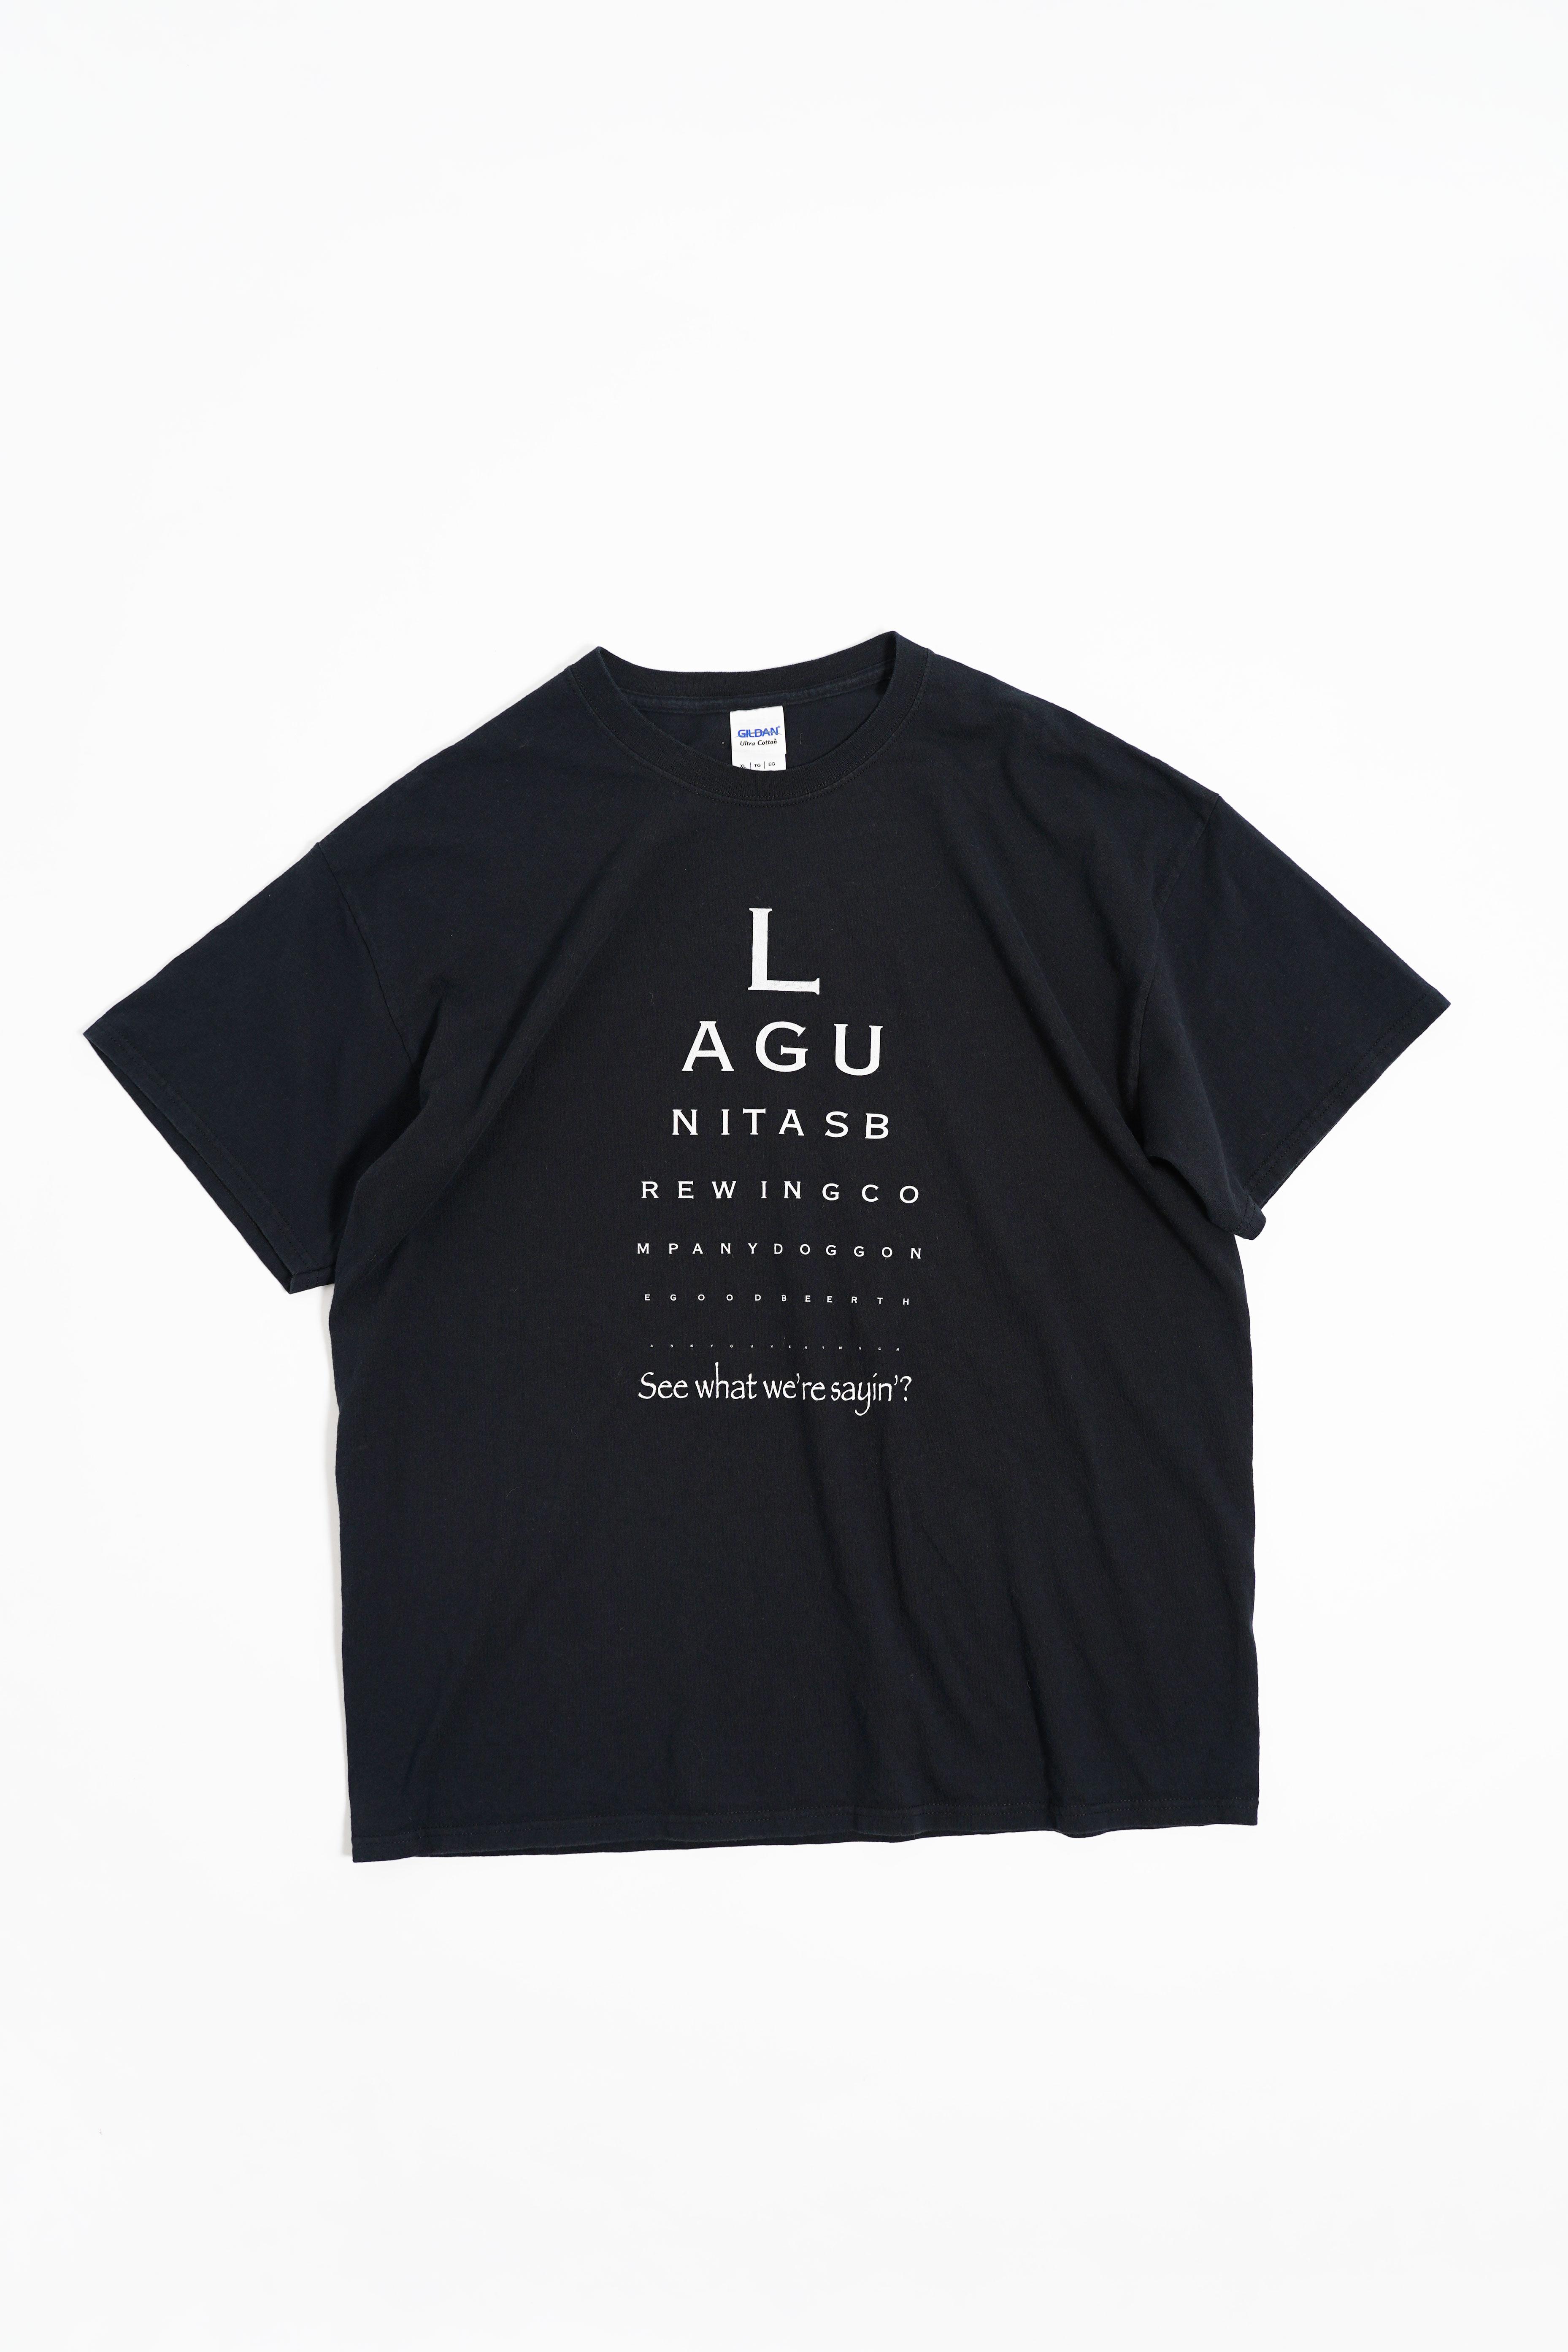 L AGU PRINTED S/S T-SHIRTS